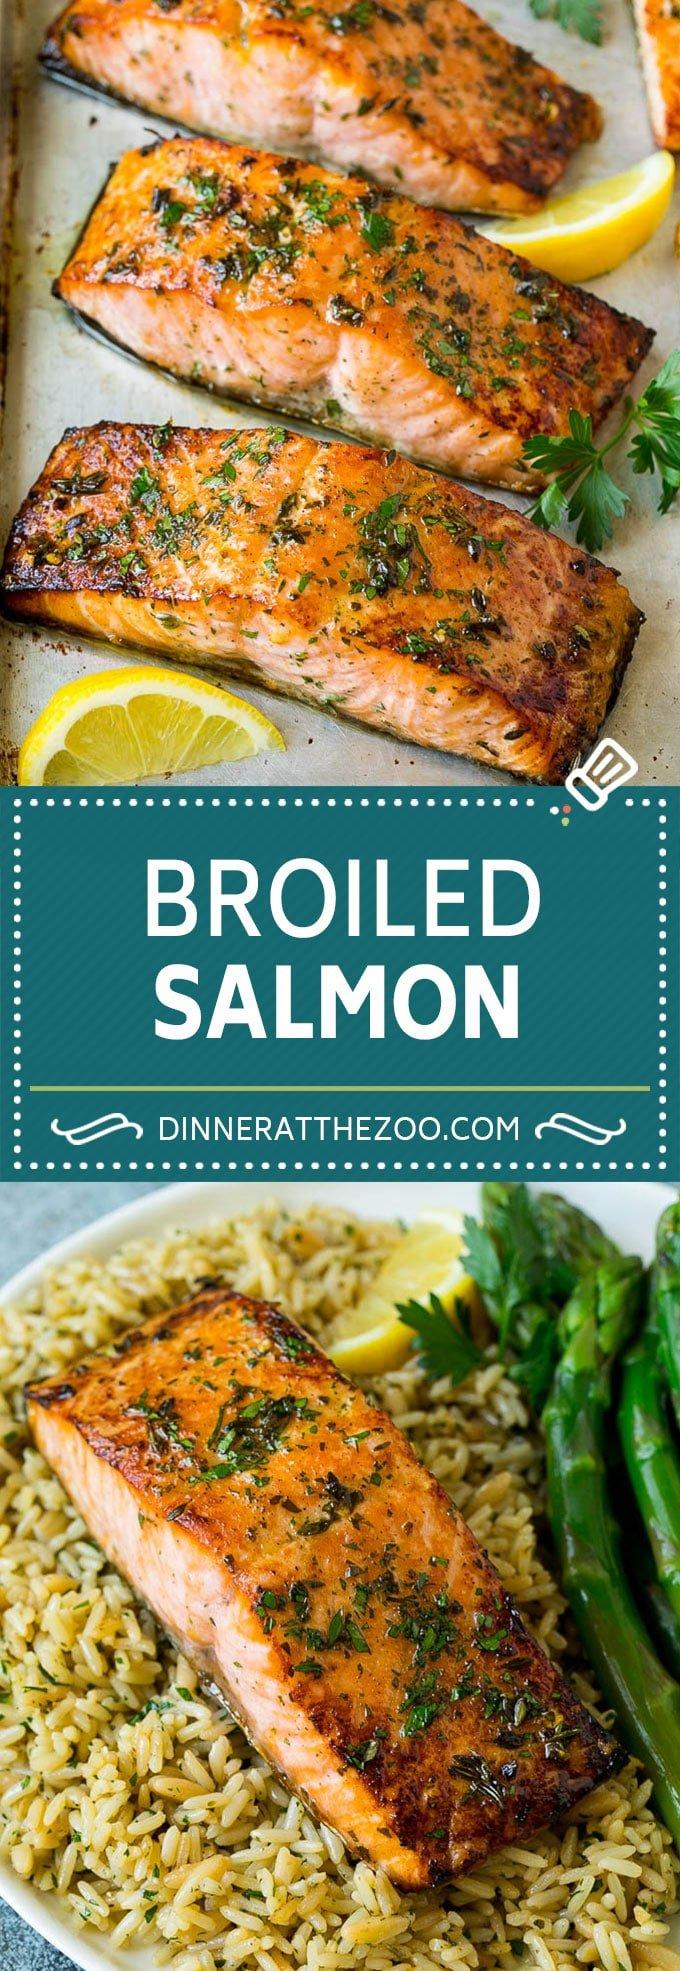 Broiled Salmon Recipe | Healthy Salmon Recipe #salmon #garlic #seafood #dinner #dinneratthezoo